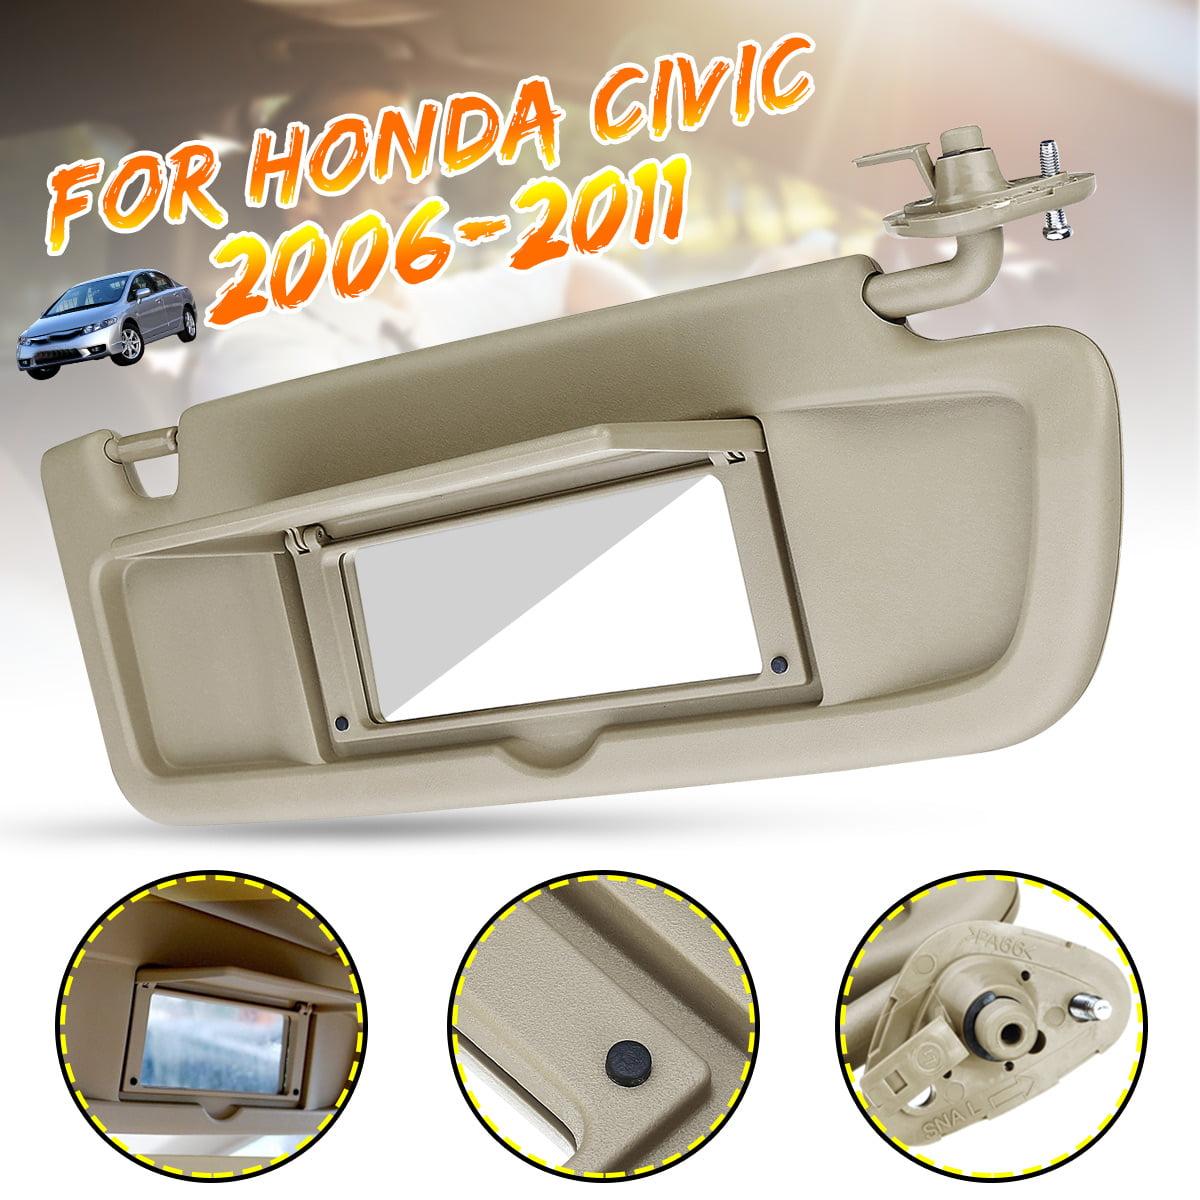 Left Driver Side Sun Visor Replacement for 2006 2007 2008 2009 2010 2011 Honda Civic EX LX Sedan SI Coupe 83280-SNA-A01ZA Sun Visor Assembly Atlas Gray